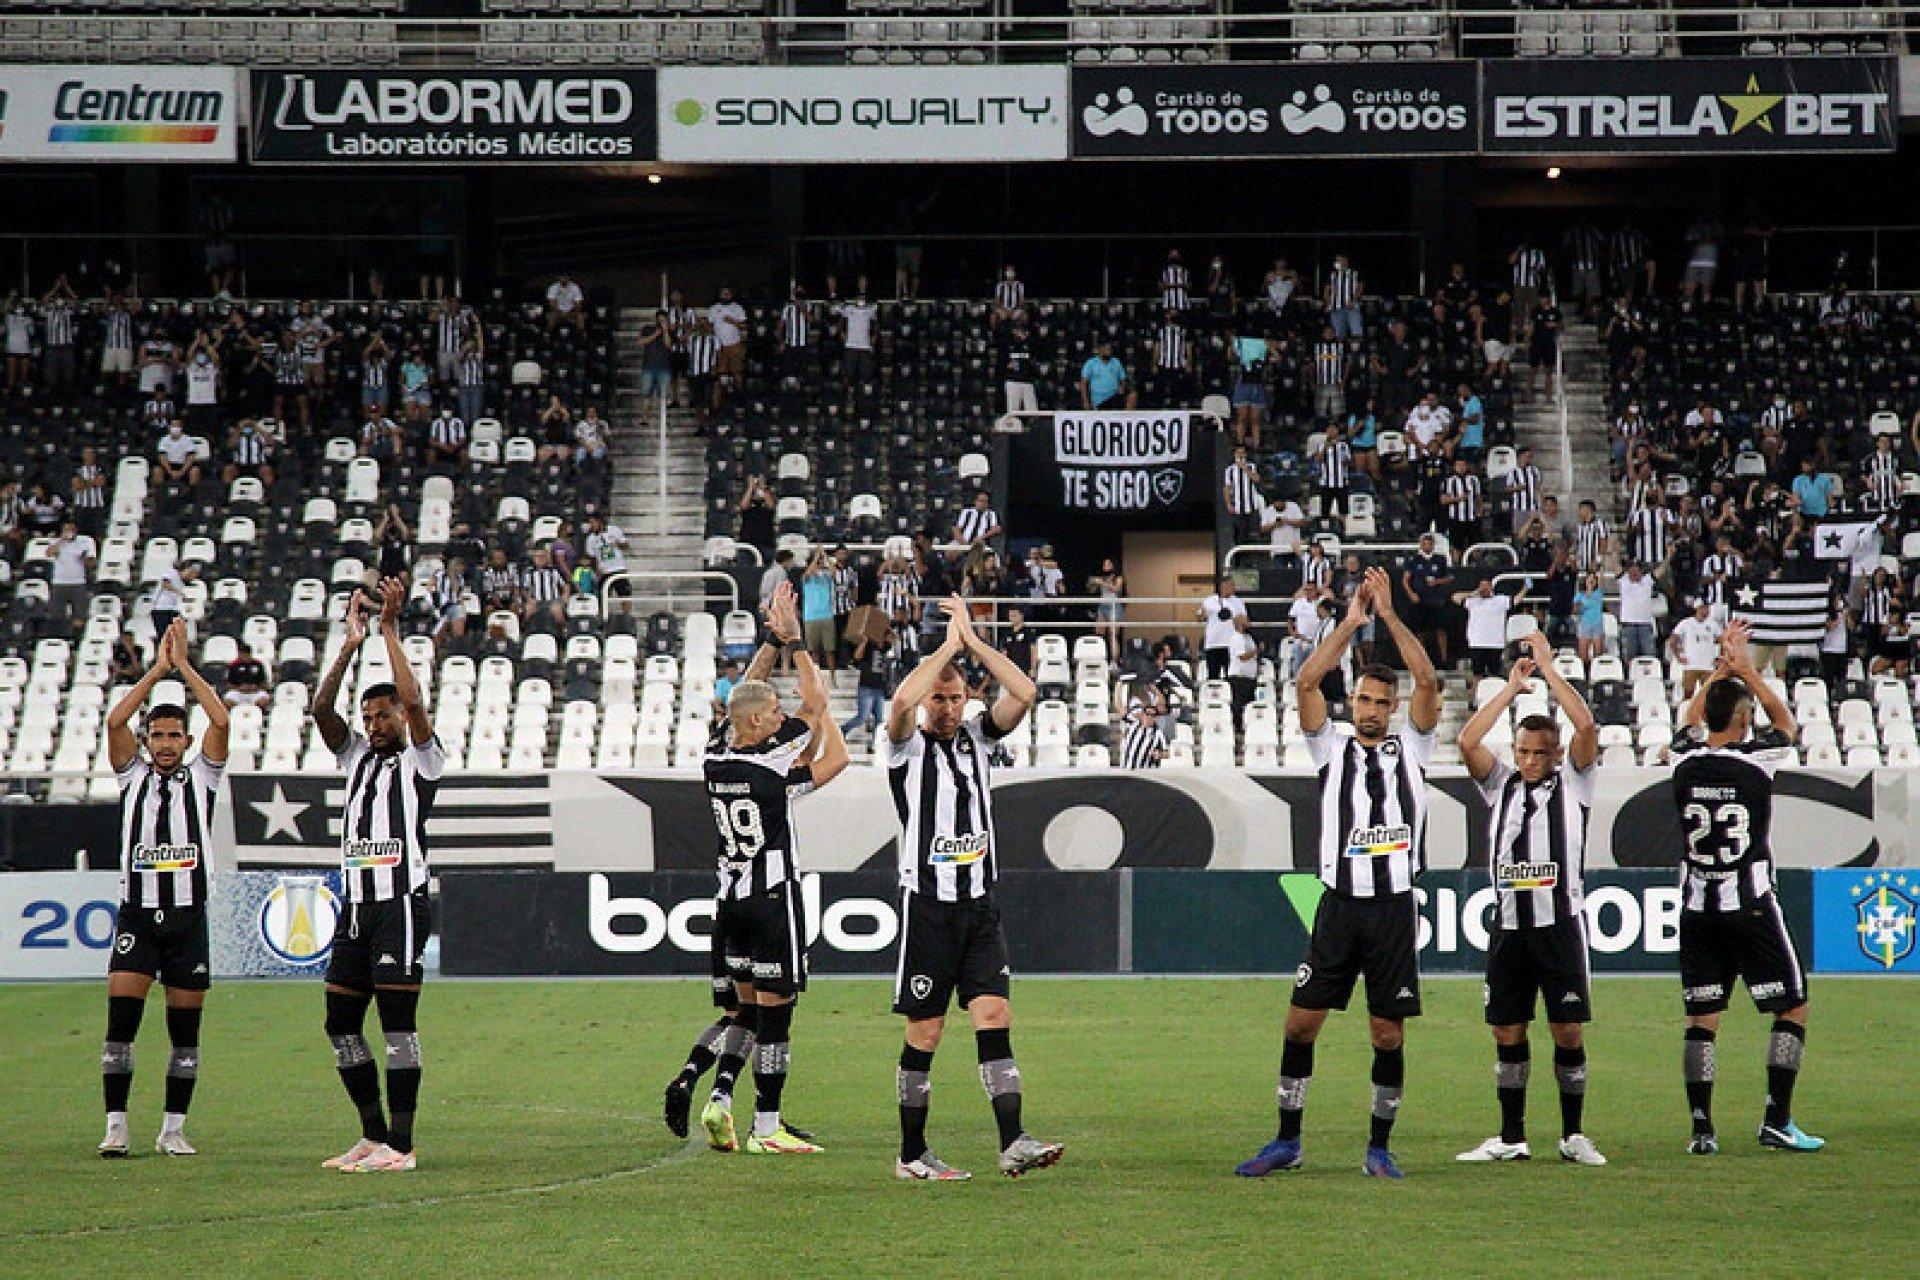 Botafogo esclarece sobre necessidade de teste da Covid-19 para acesso ao Estádio Nilton Santos